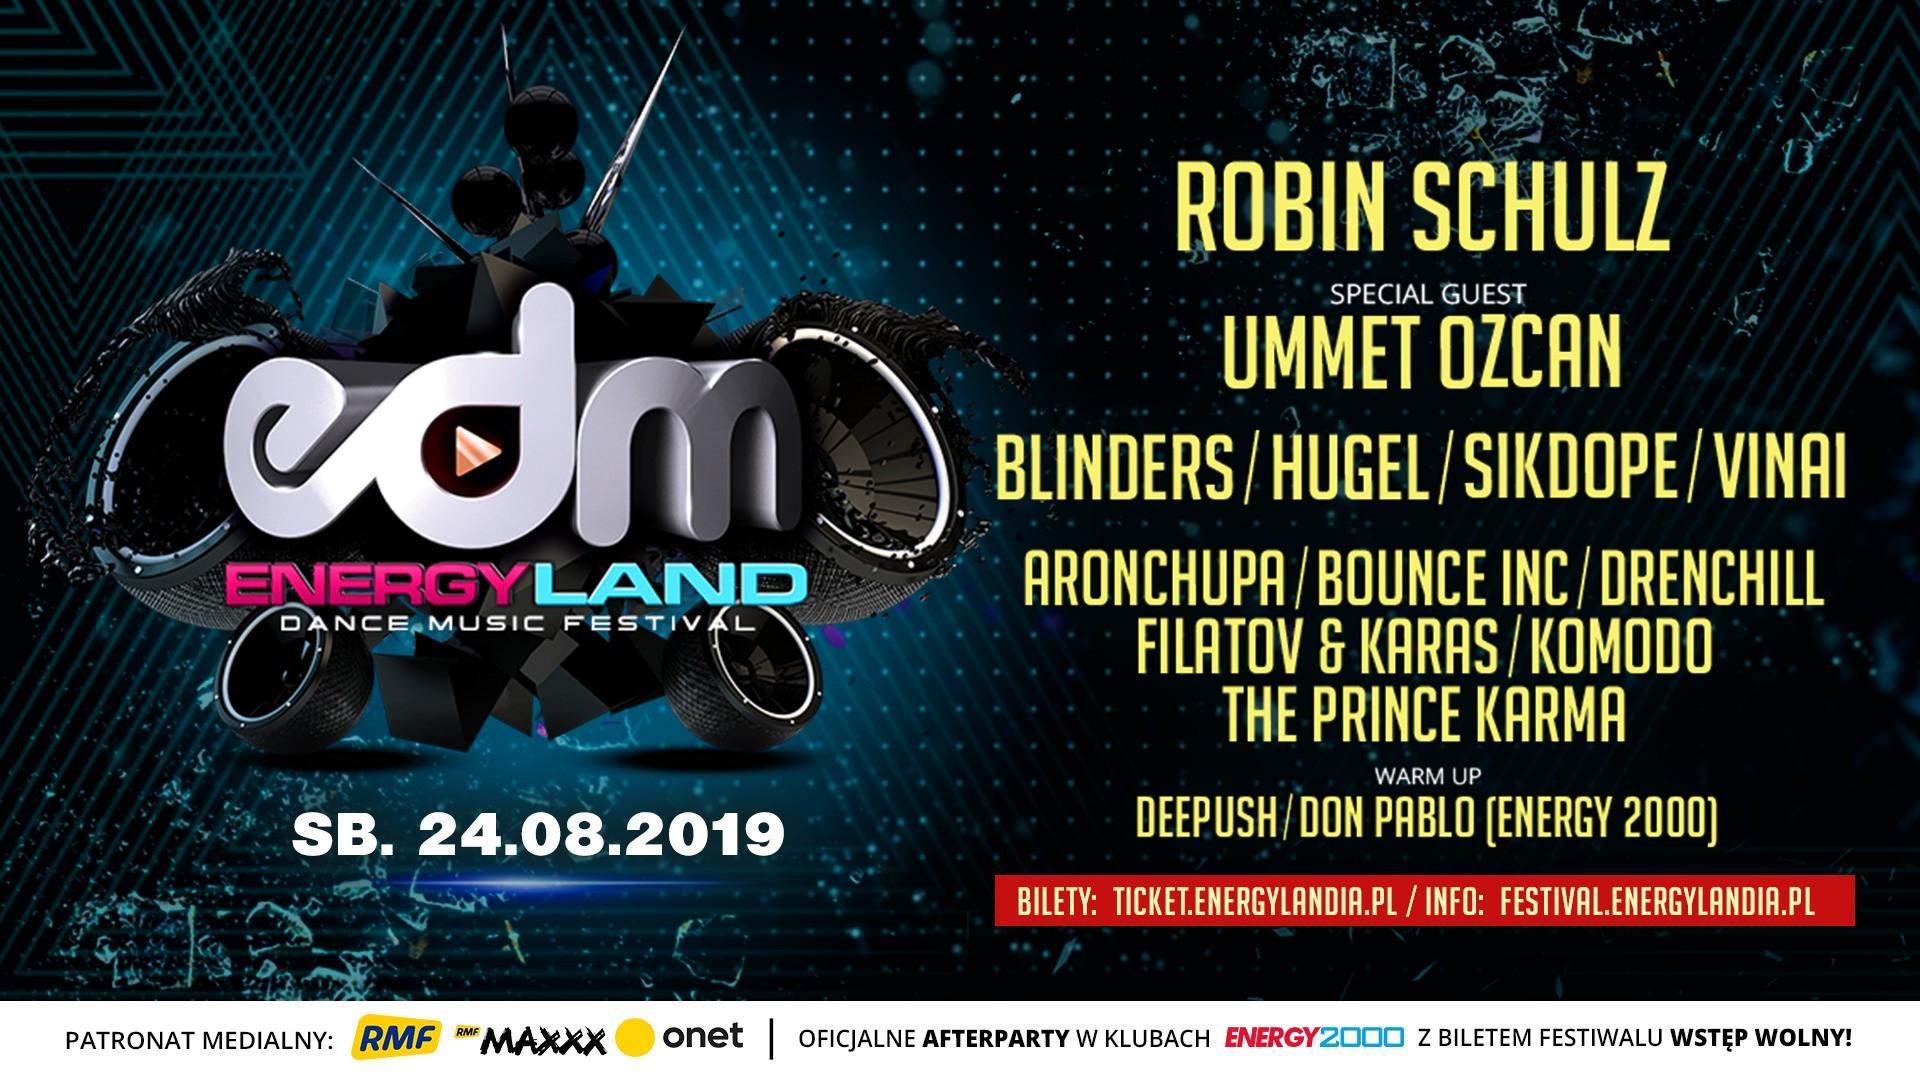 https://energylandia.pl/wydarzenia/edm-festival-w-energylandia